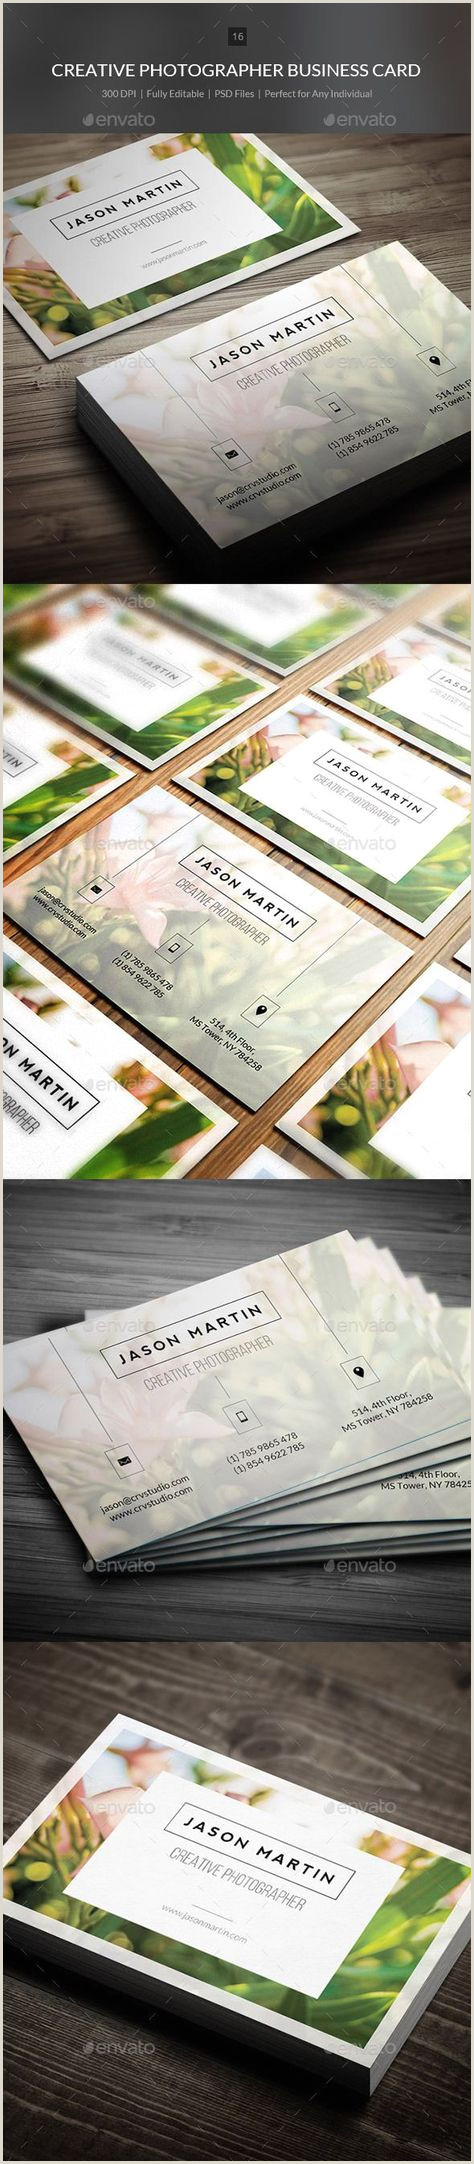 Unique Photography Business Card 40 Trendy Ideas Photography Business Cards Template Creative